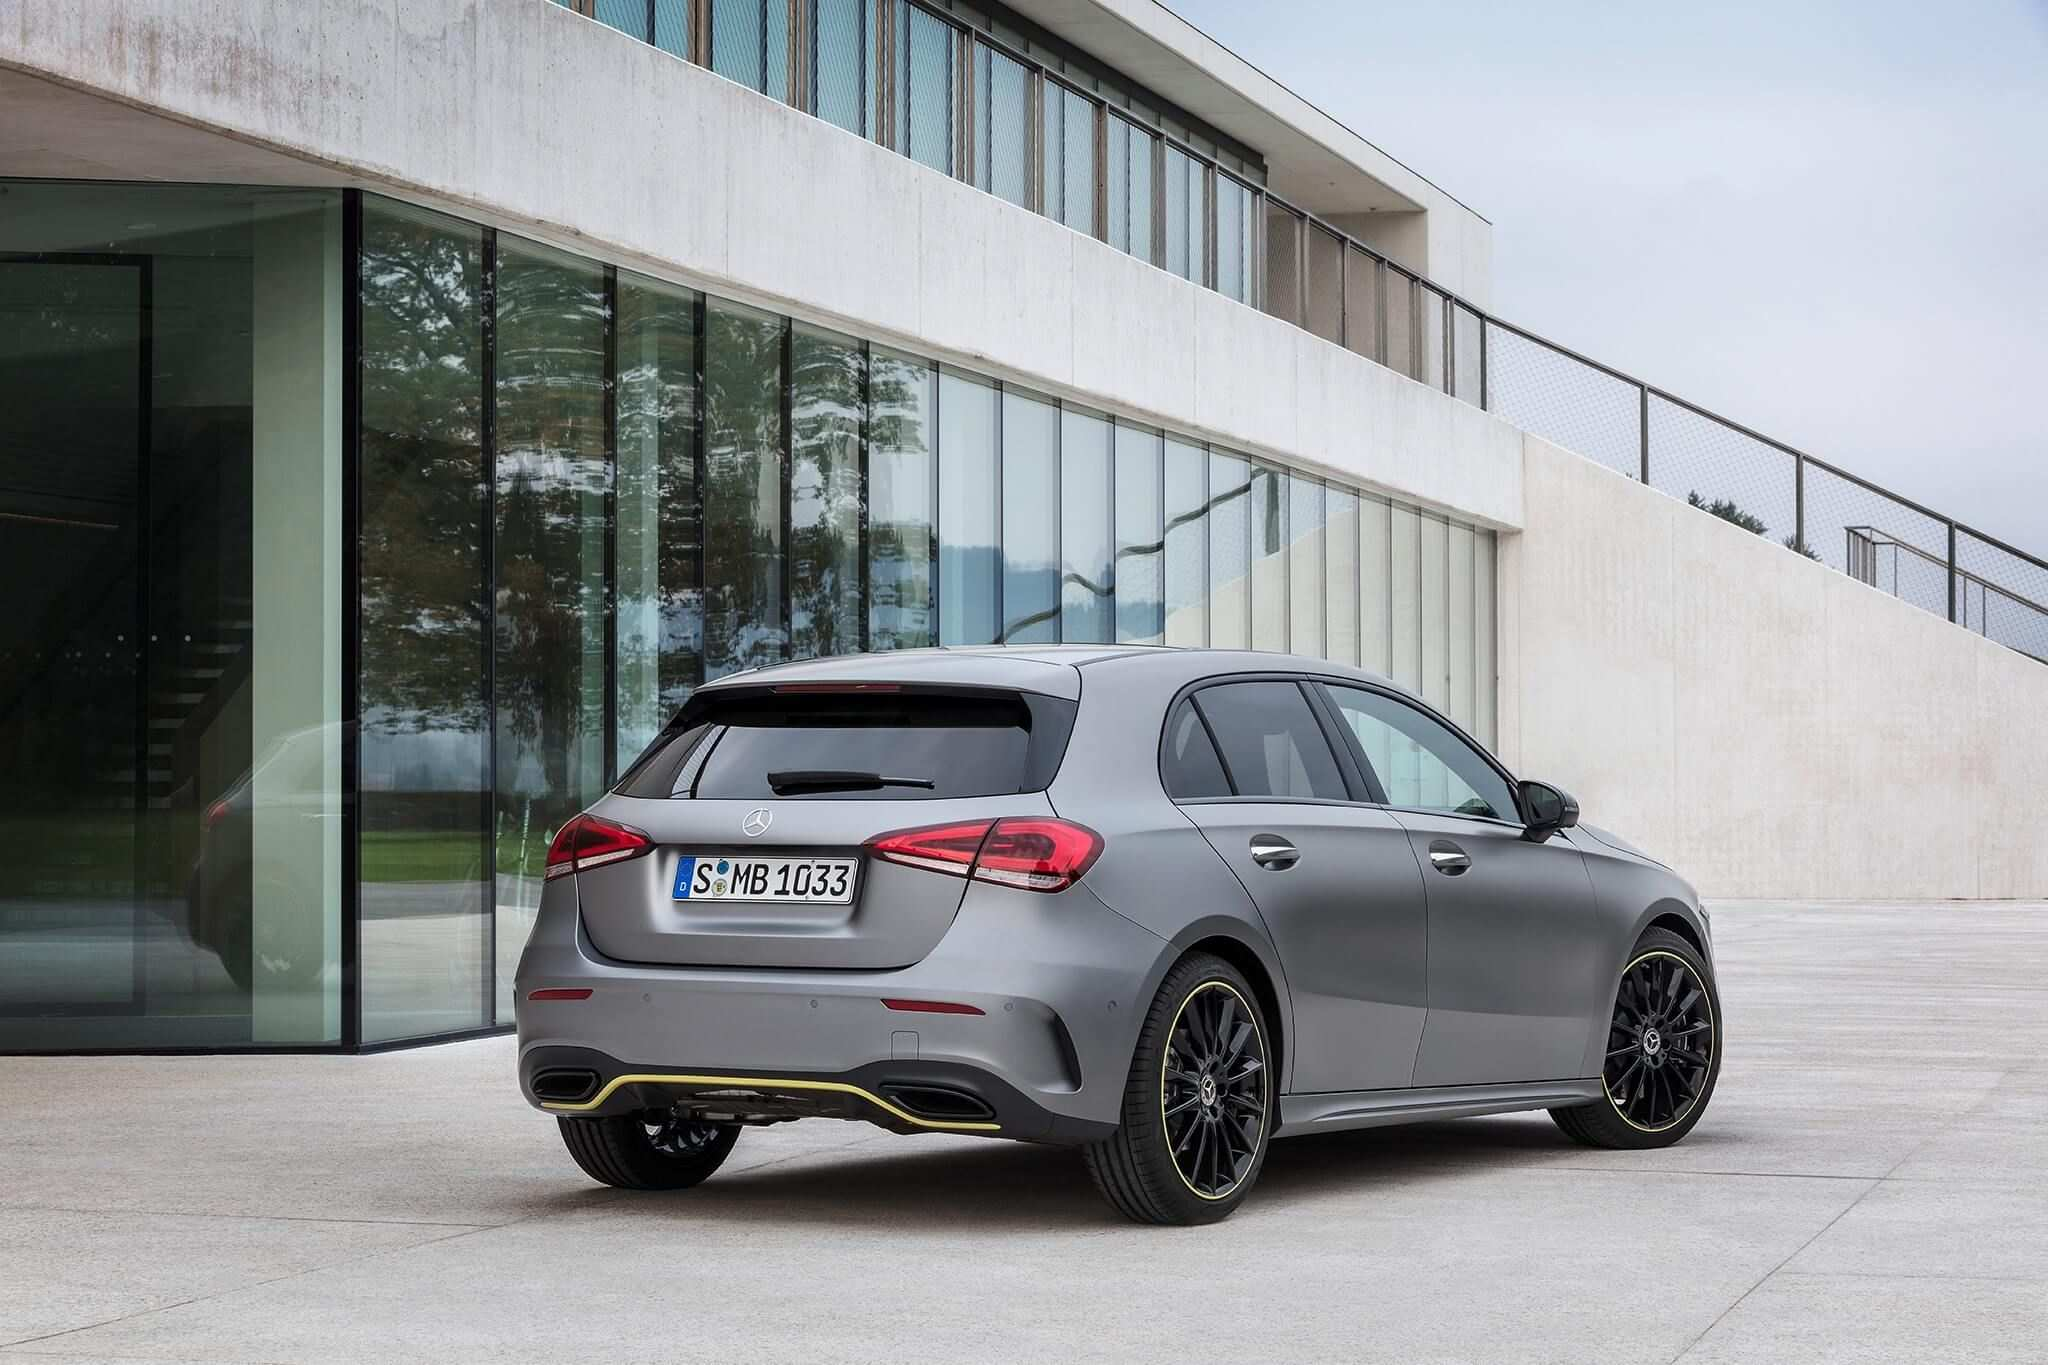 66 Best Review Mercedes 2020 Hatchback Overview by Mercedes 2020 Hatchback